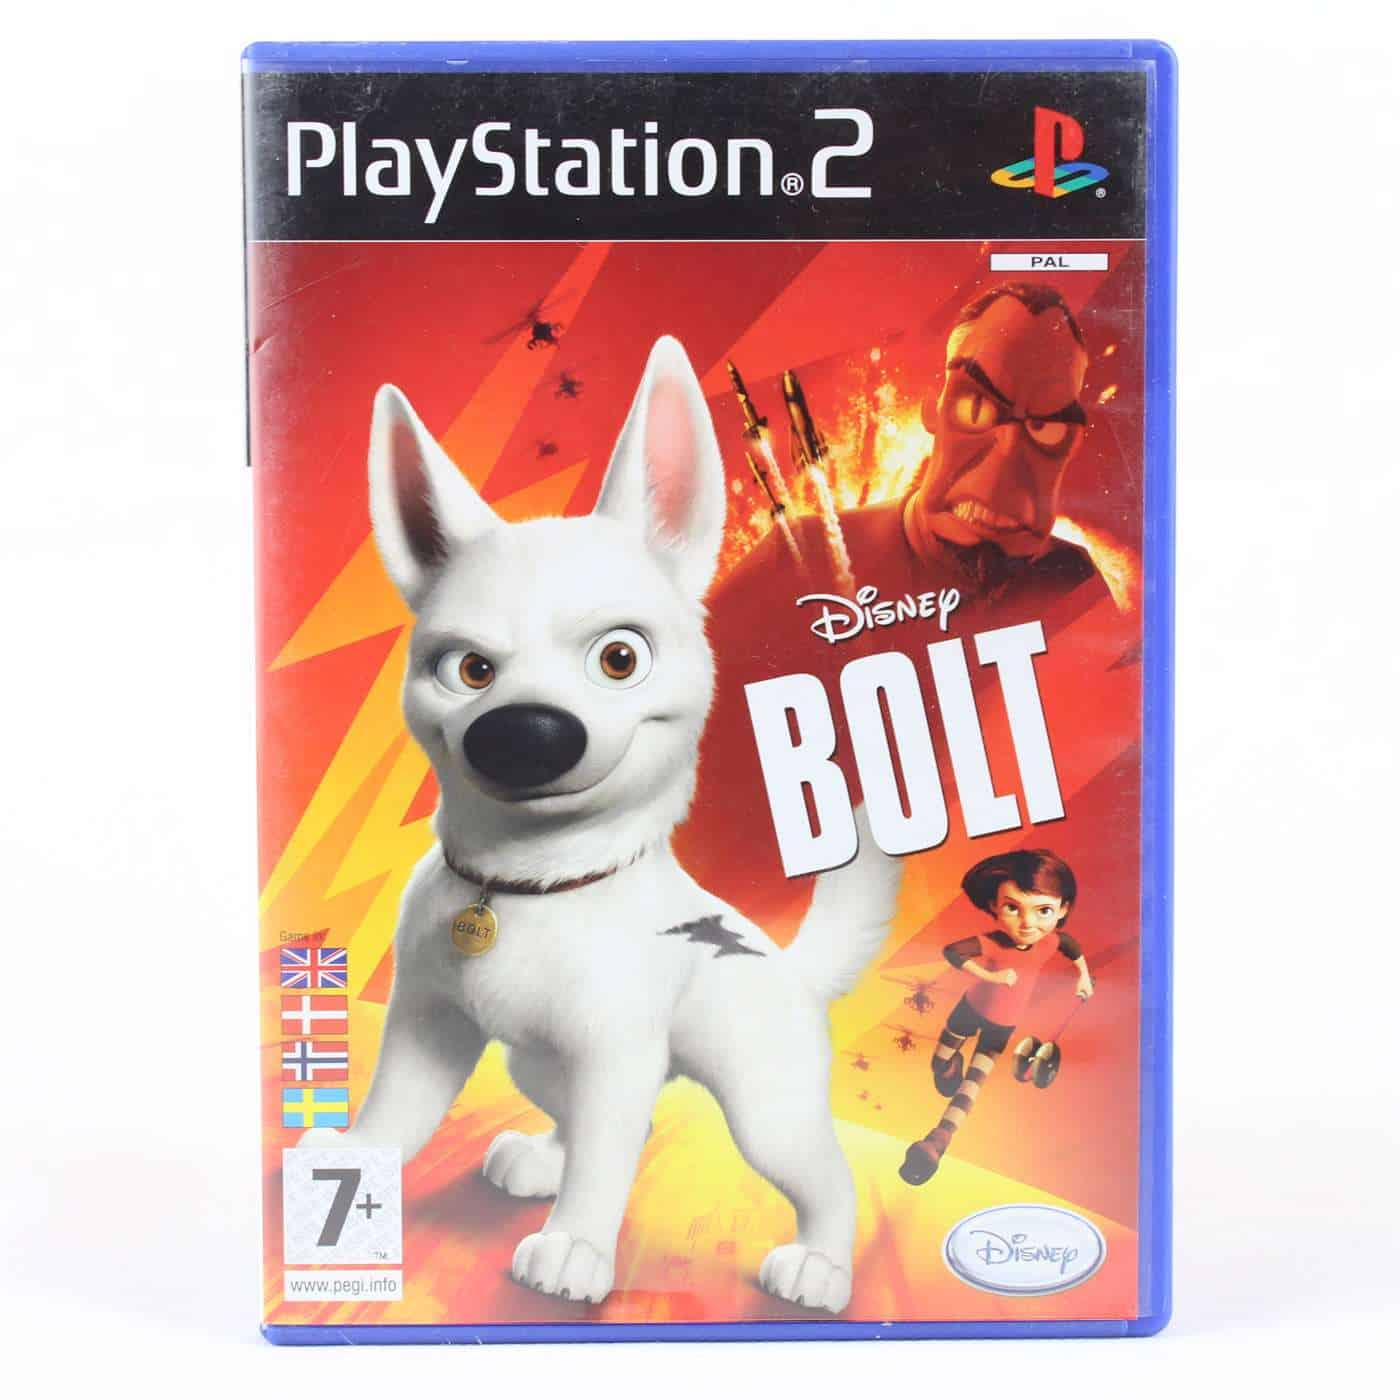 Disney Bolt (Playstation 2)